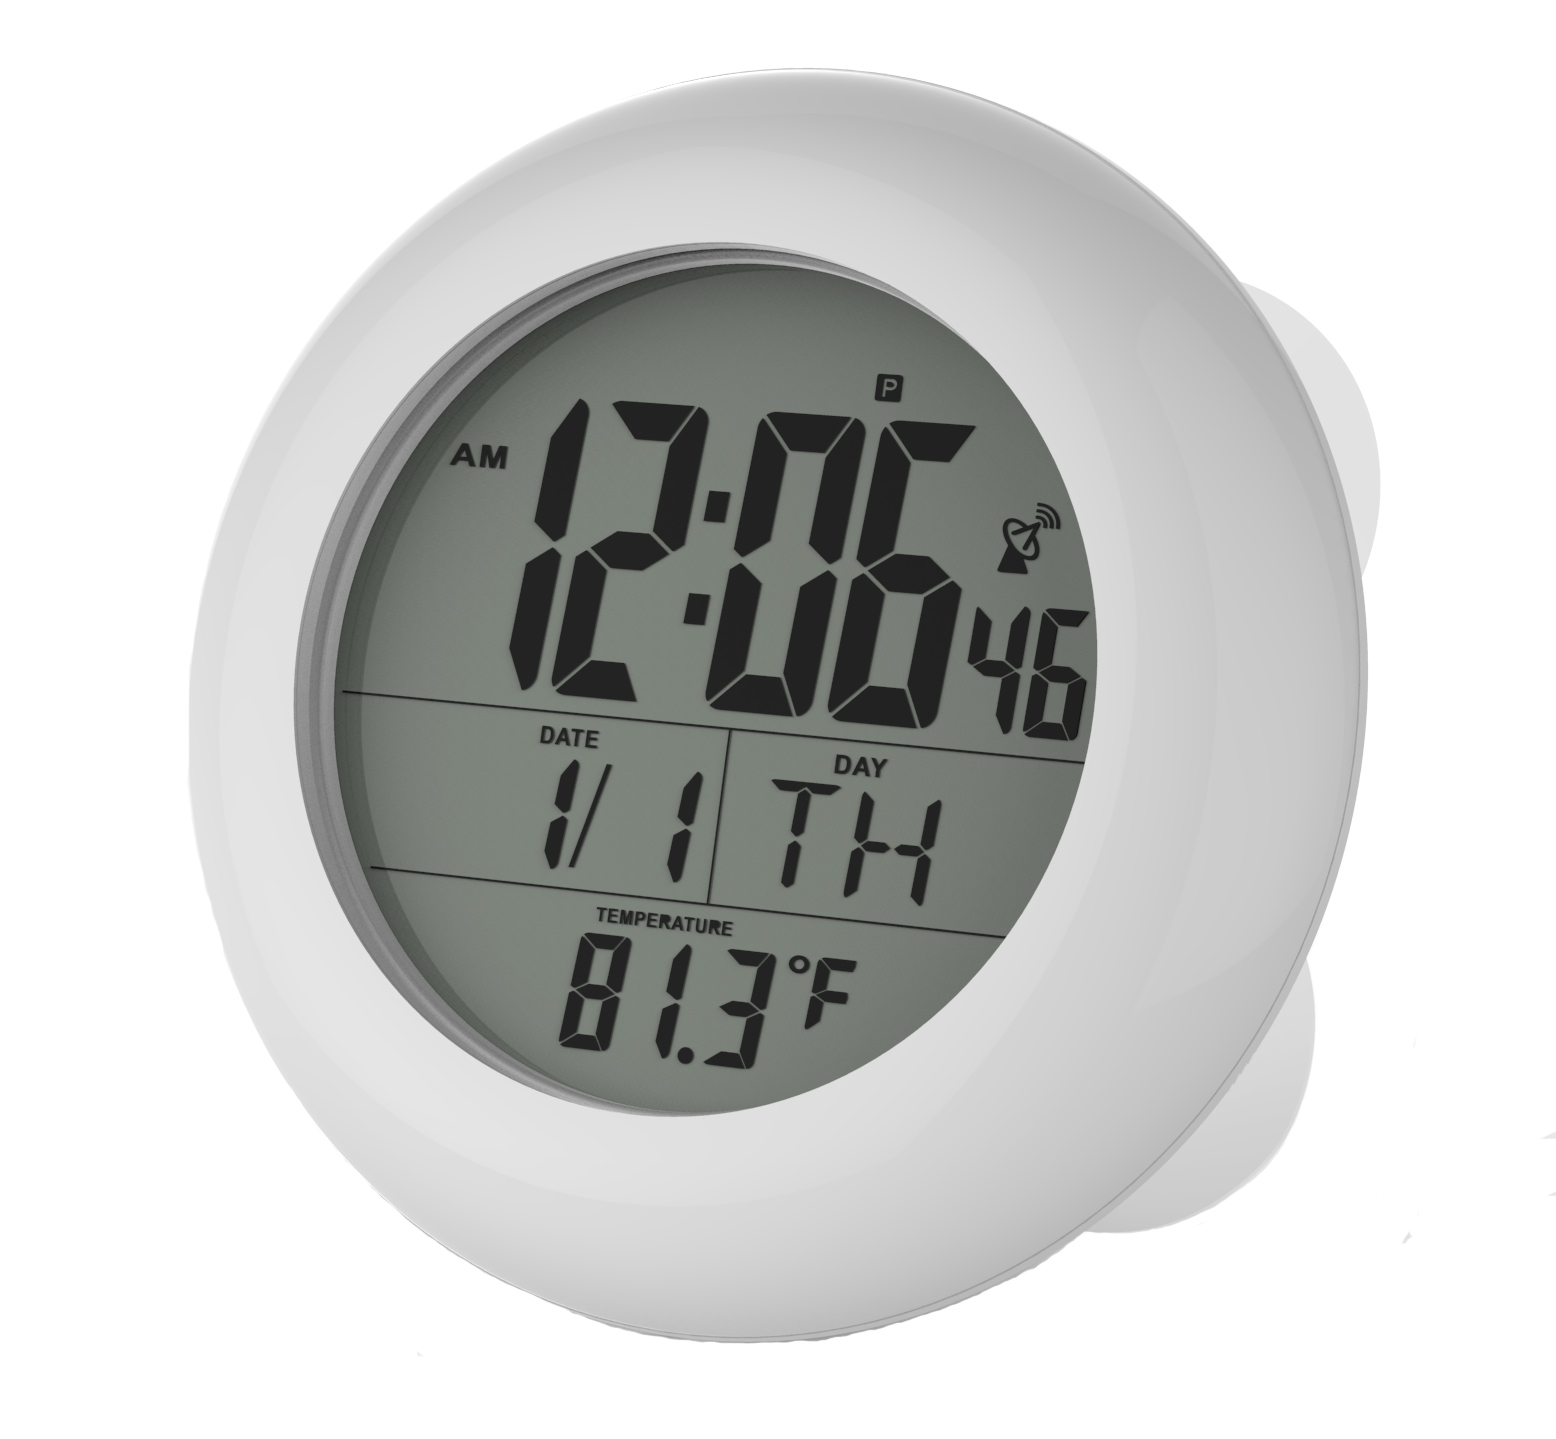 Sonnet Ken-Tech T-4652 Atomic Radio Controlled LCD A larm Clock Black Blue Light 1.5-Inch